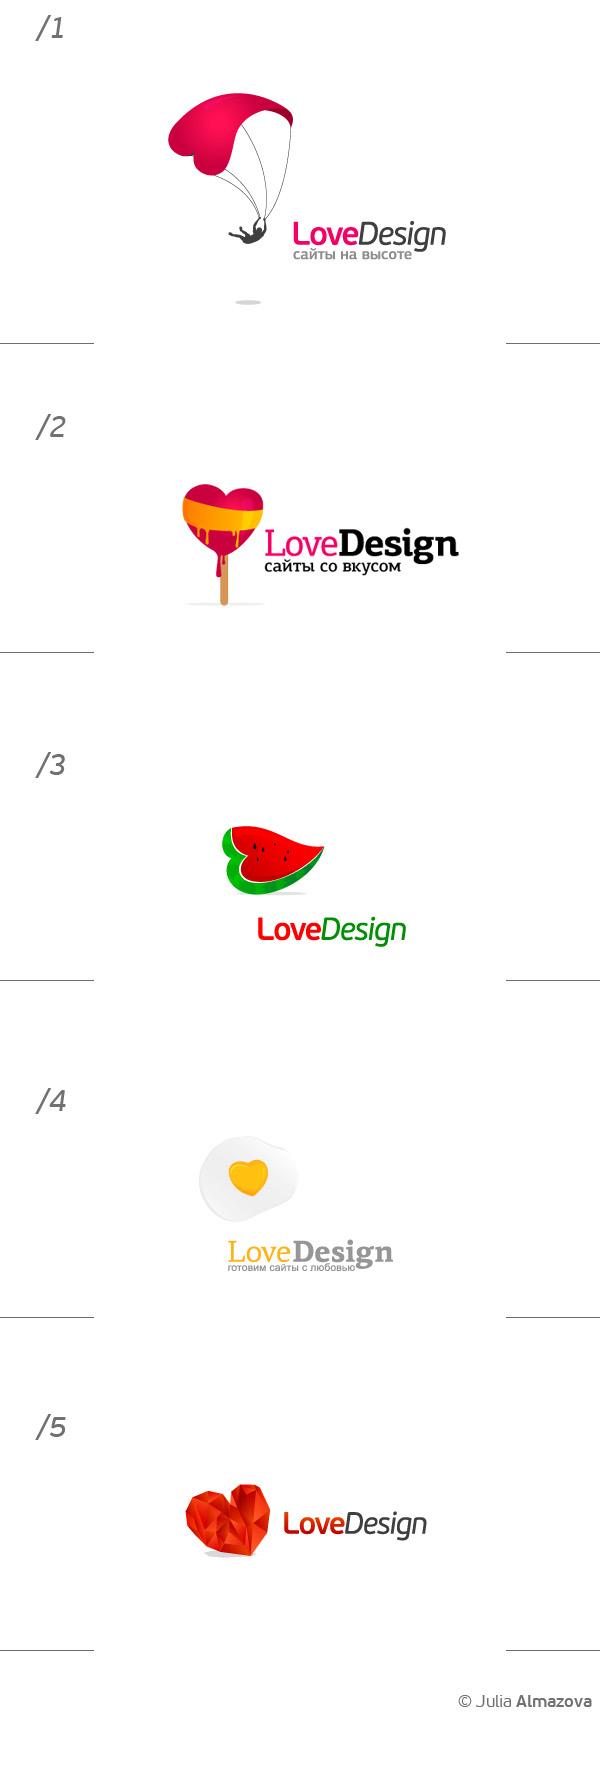 LoveDesign